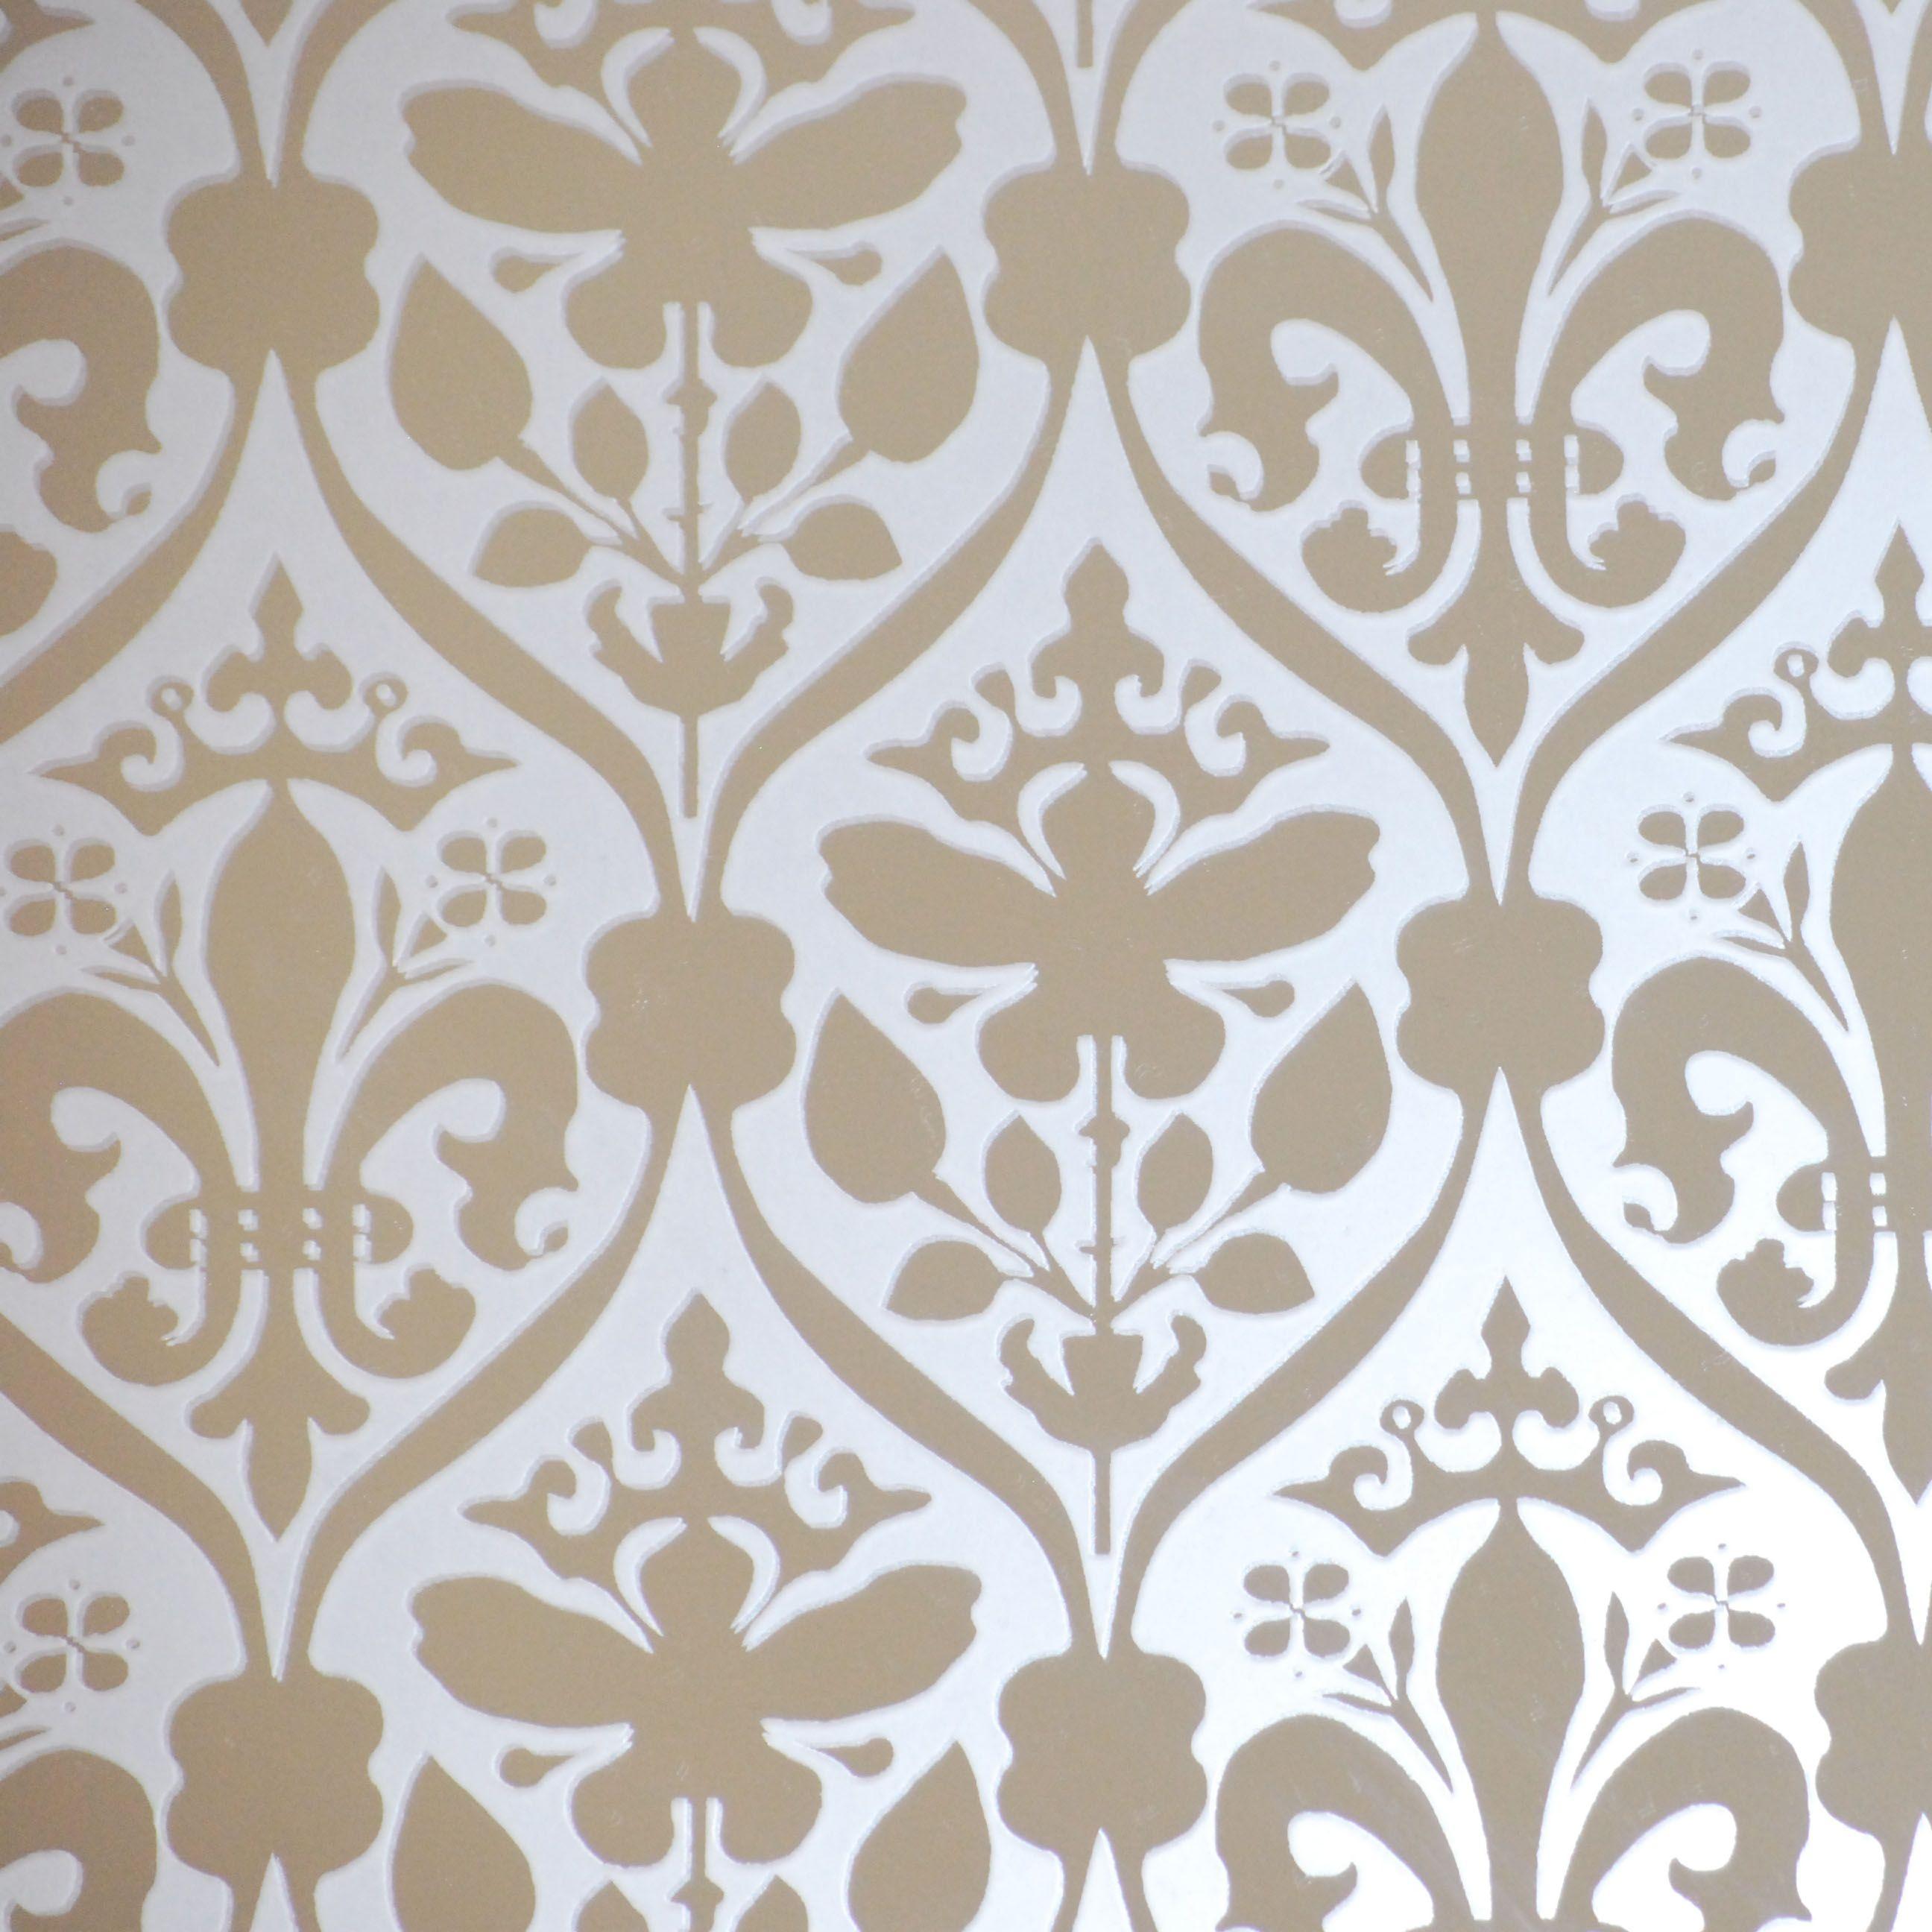 metal hook decorative brown fleur de lis - Google Search | Interiors ...